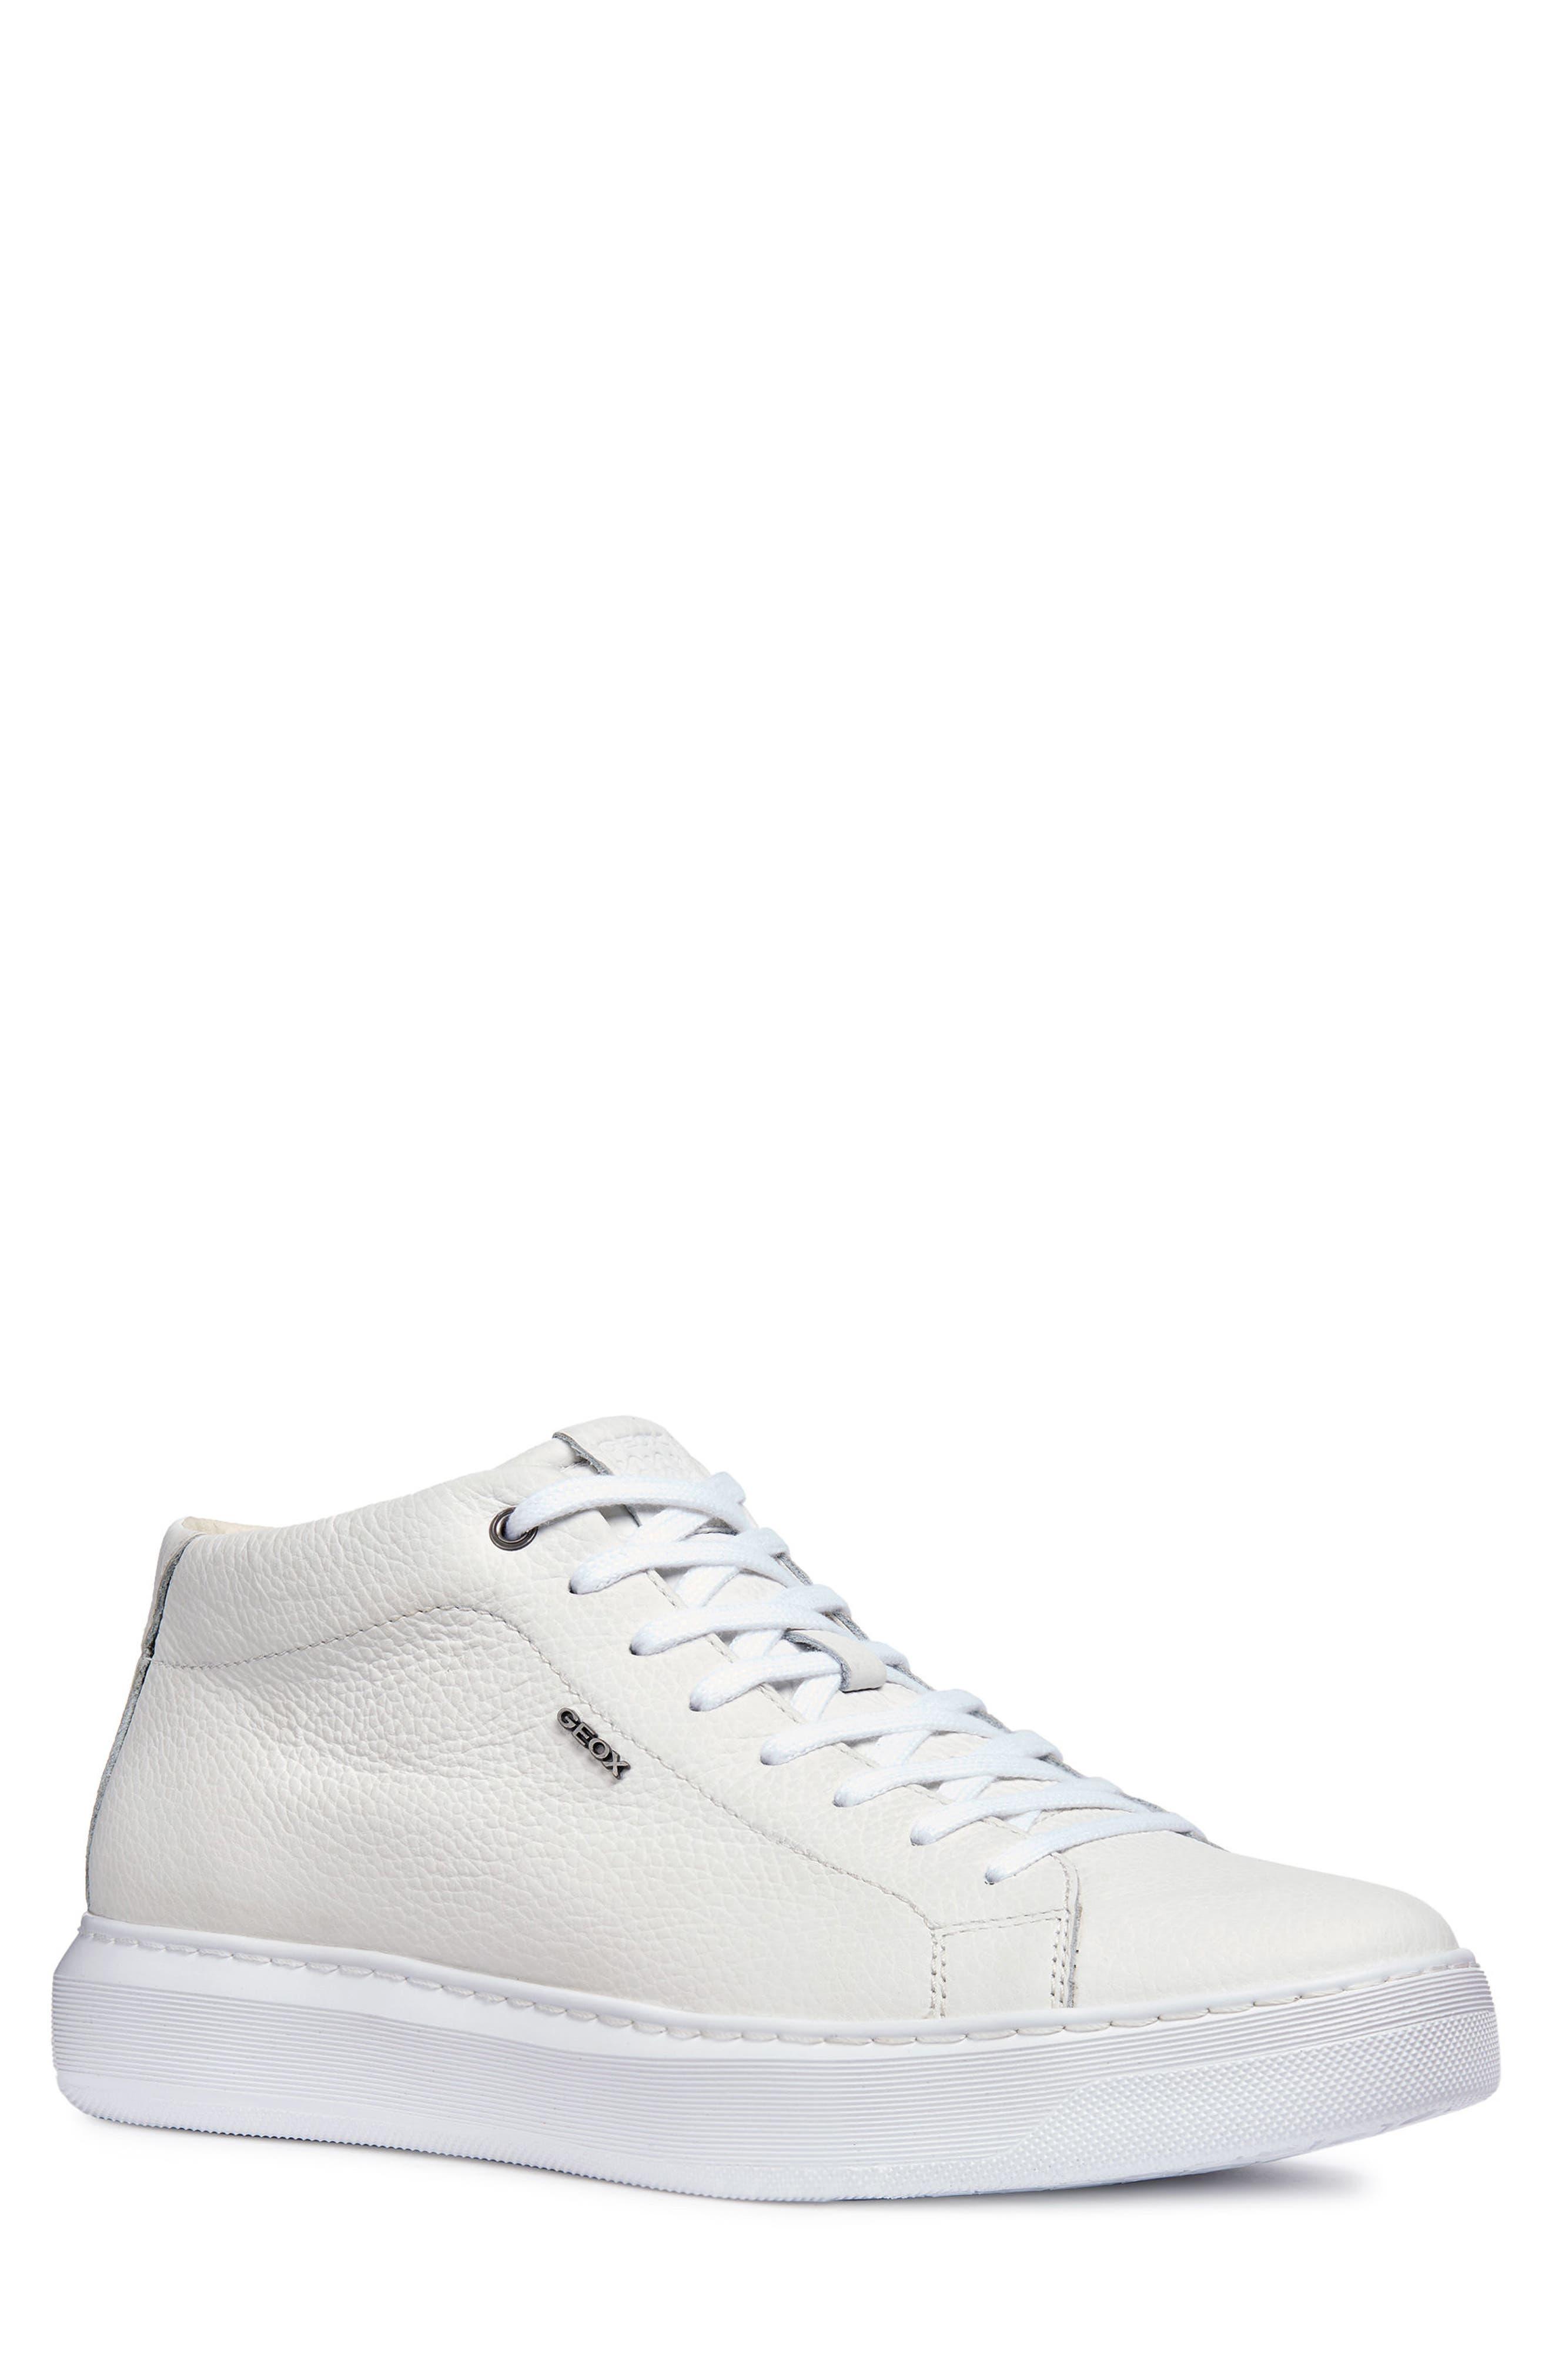 Deiven 3 Mid Top Sneaker,                             Main thumbnail 1, color,                             100